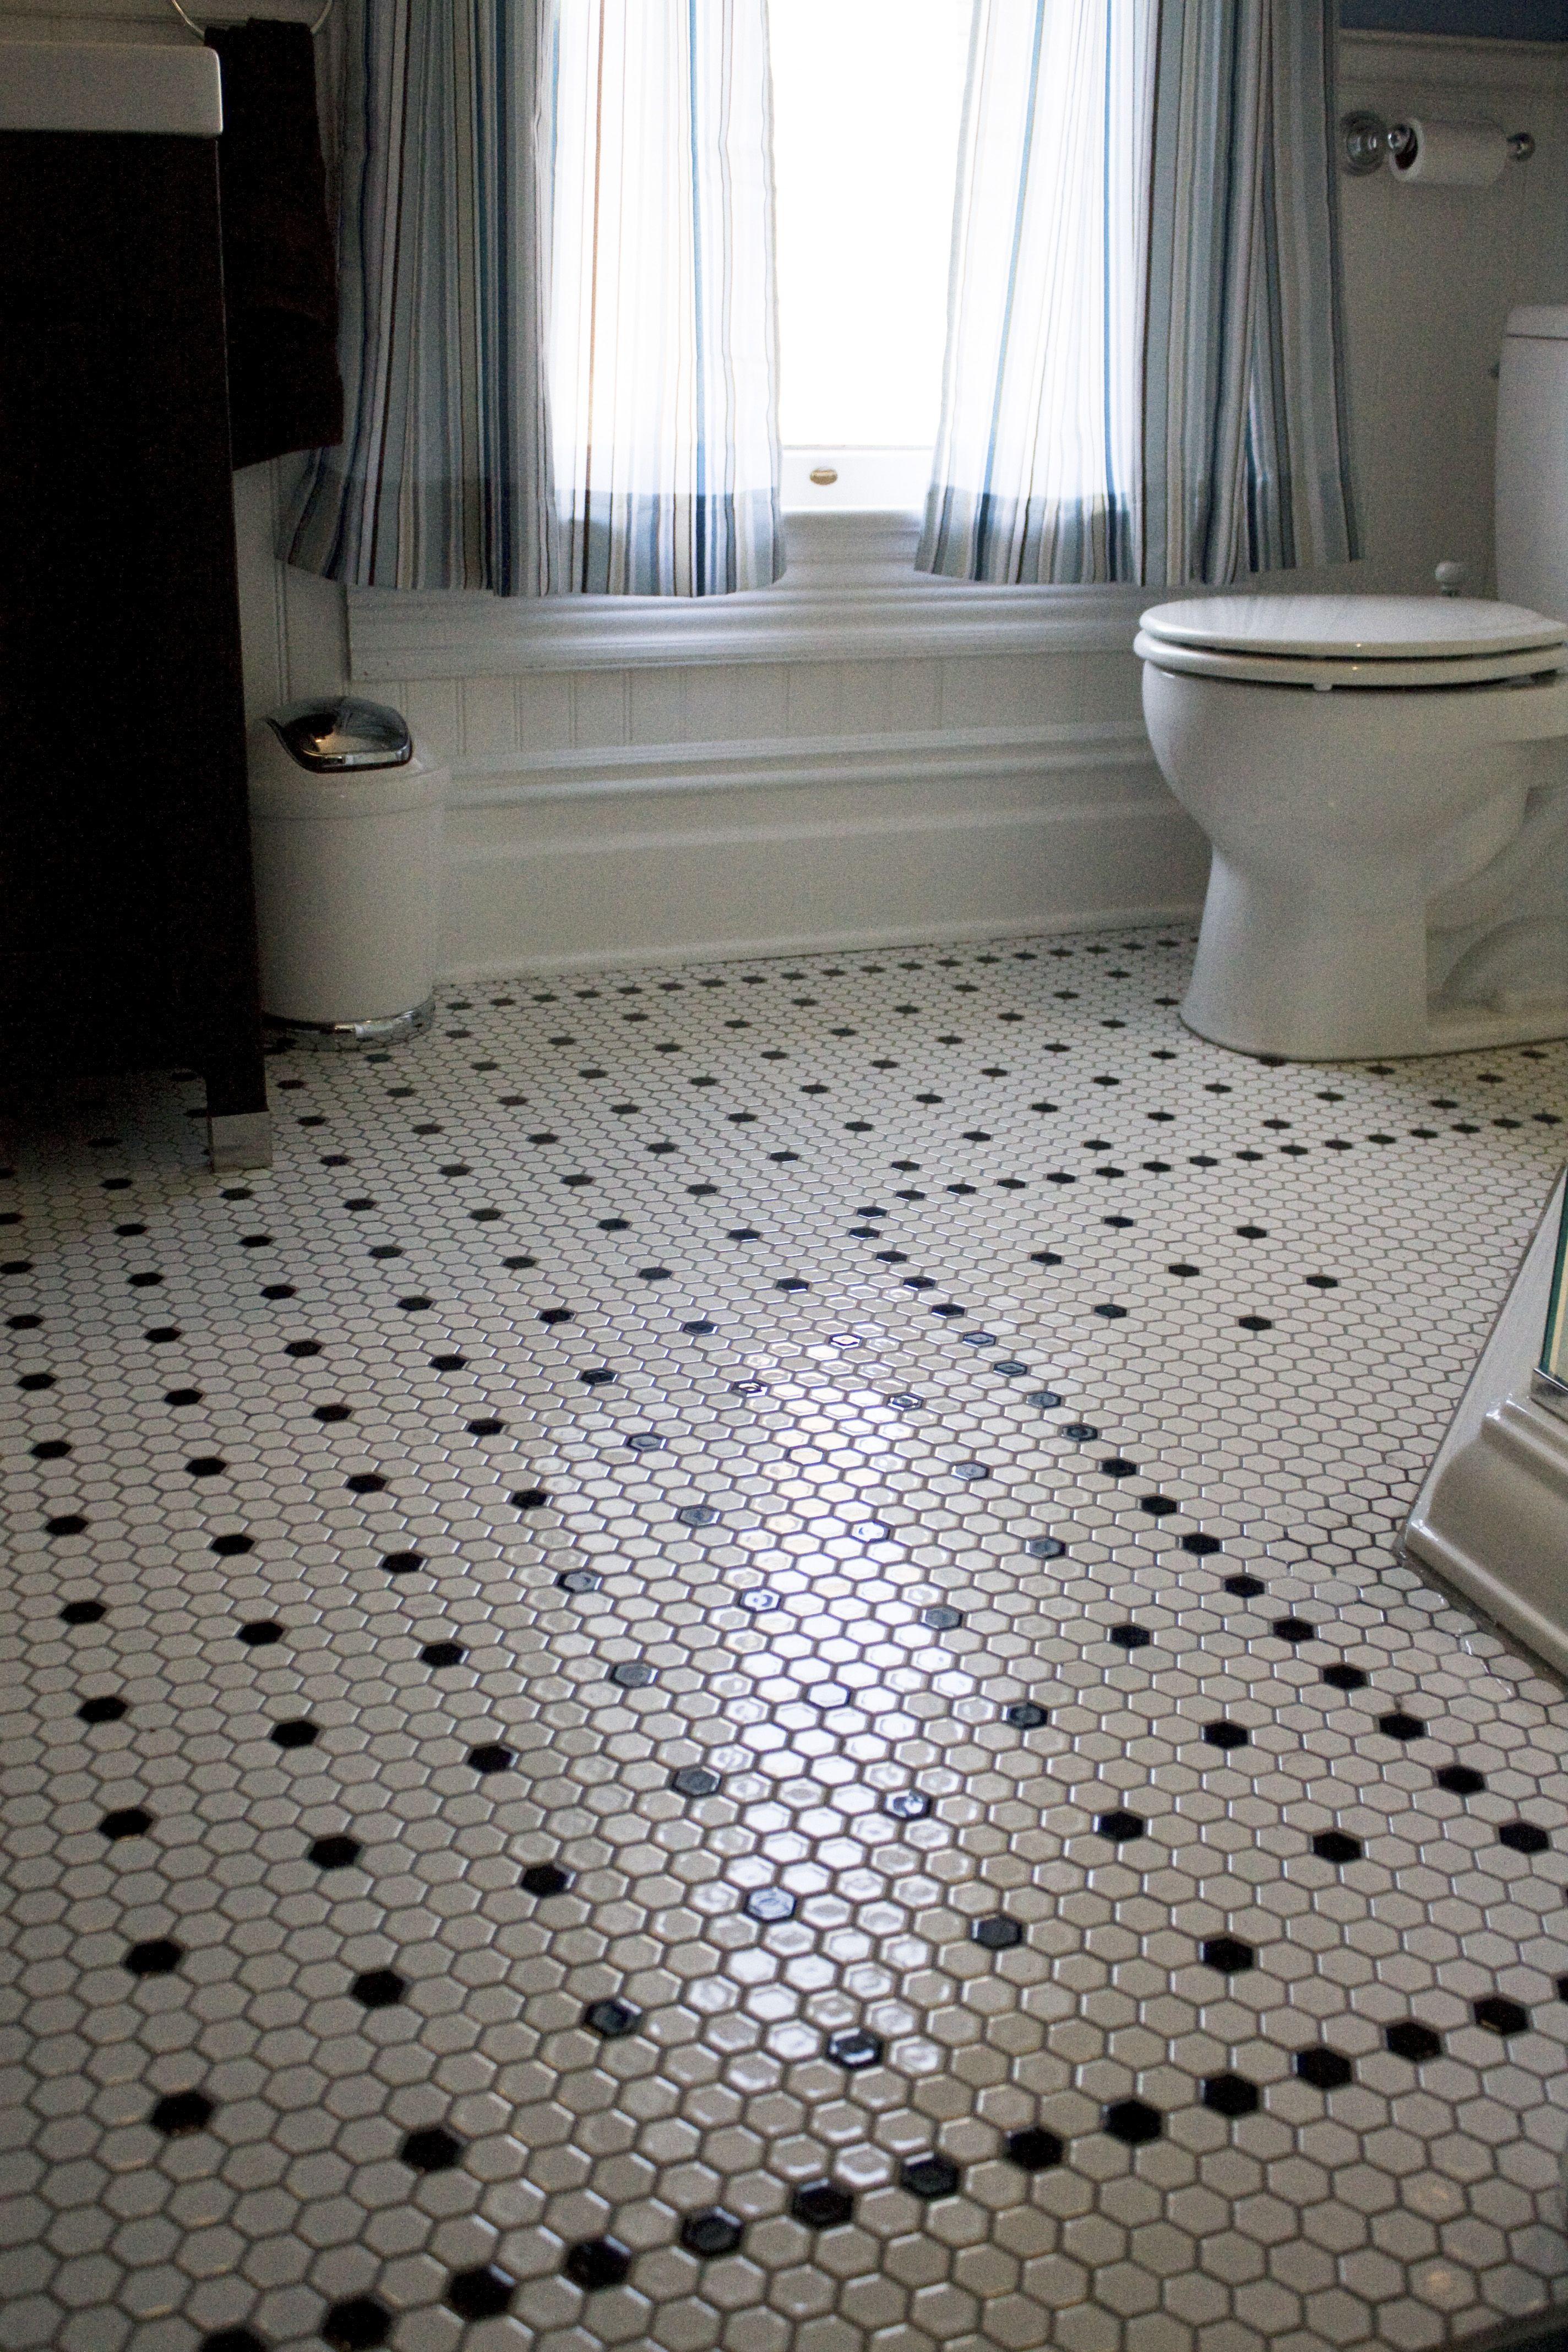 Hex Floor Tile Bathroom Google Search Tilebath